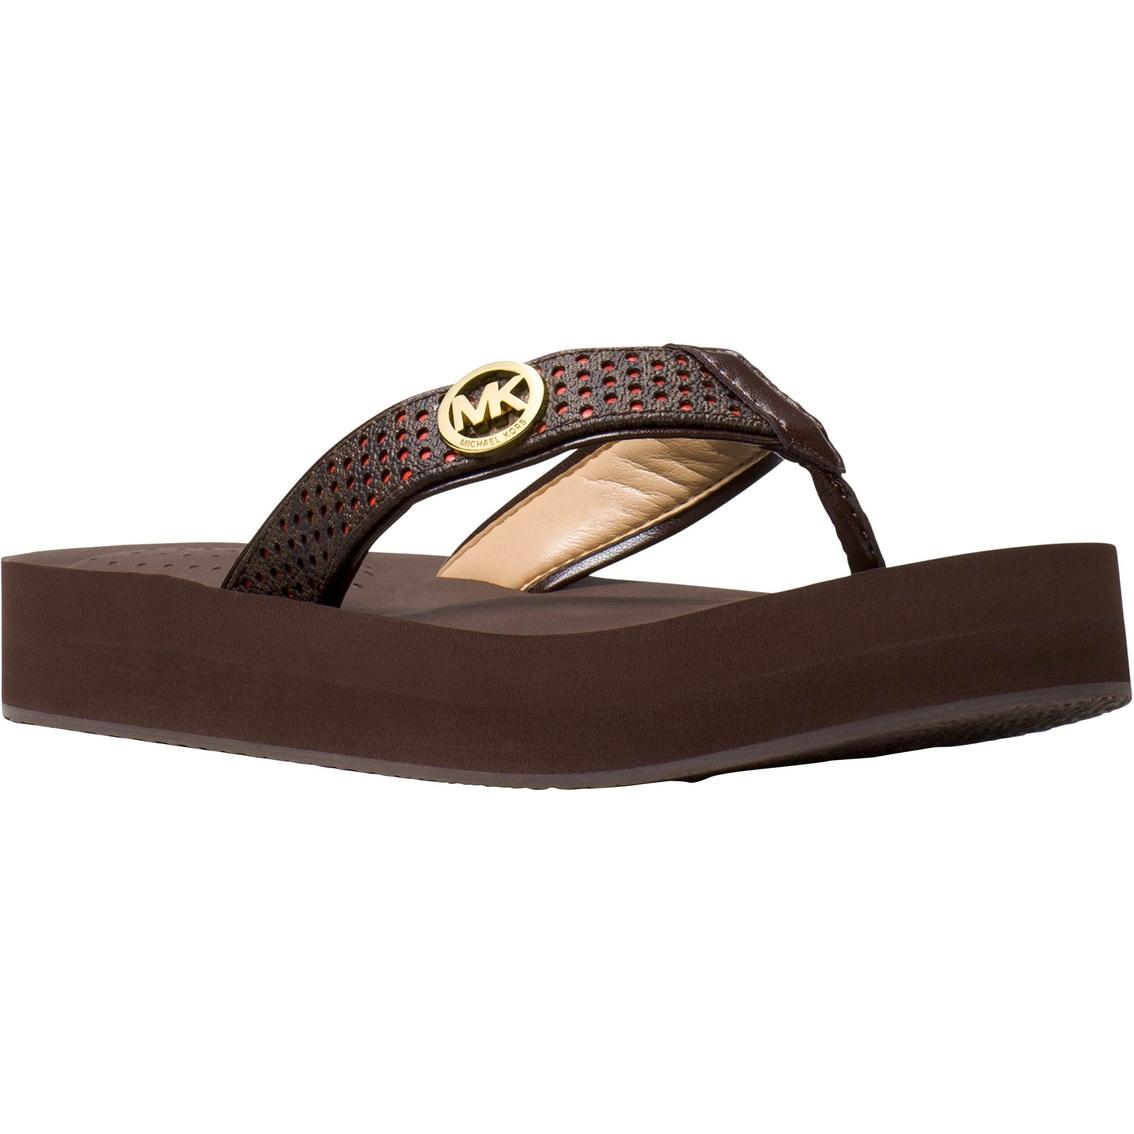 4250fd0cf Michael Kors Gage Flip Flop Sandals